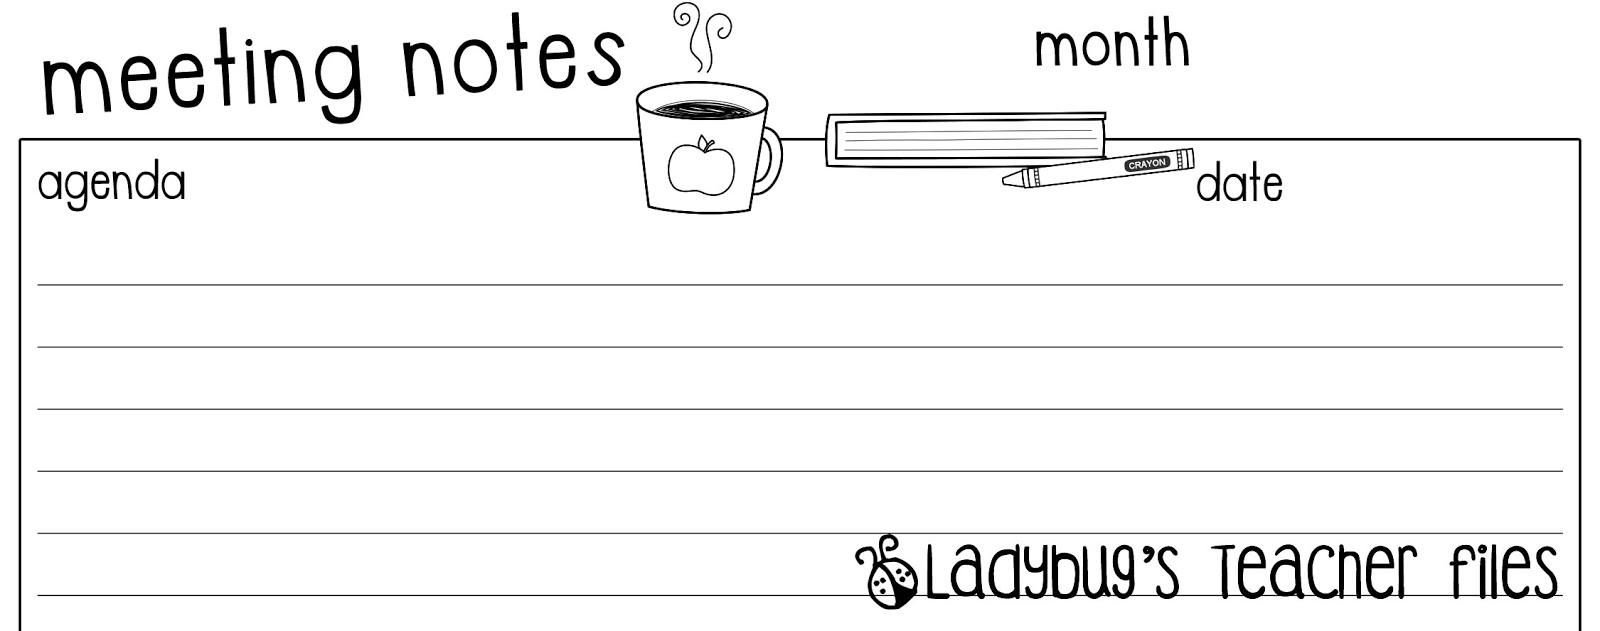 meeting notes  file to share   u2013 ladybug u0026 39 s teacher files